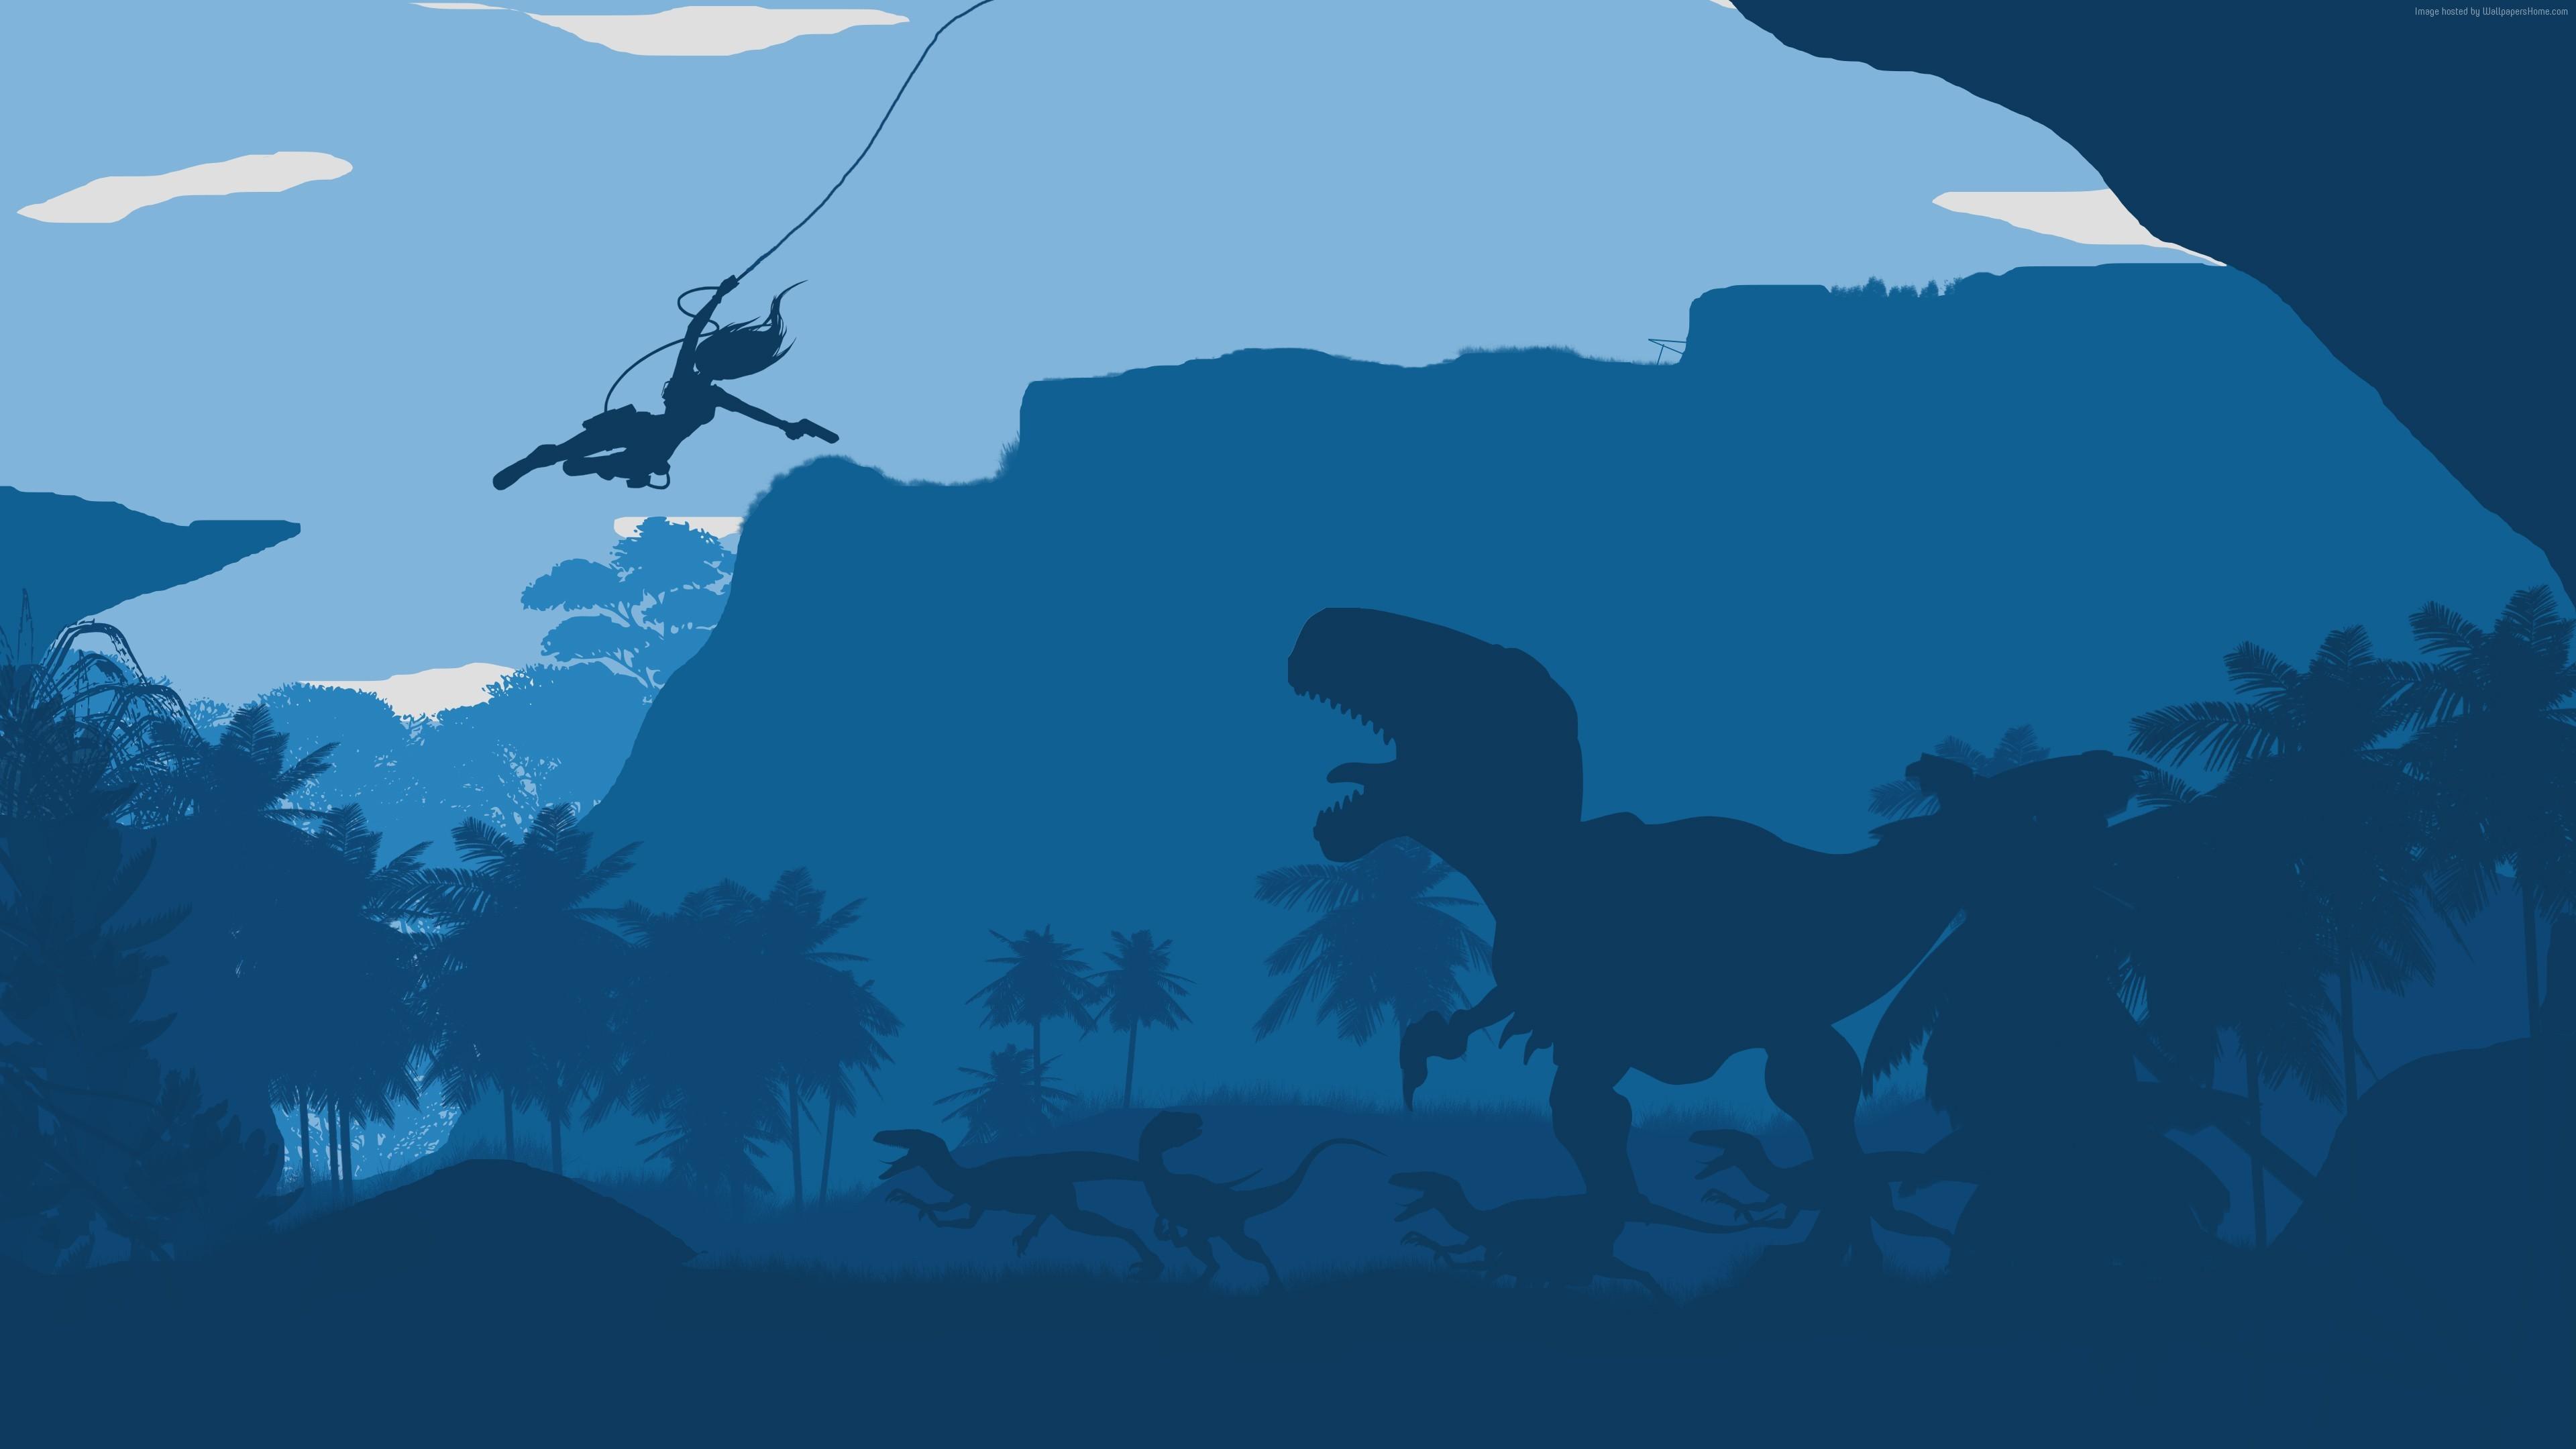 tomb raider dinosaur minimalism 4k 1540751147 - Tomb Raider Dinosaur Minimalism 4k - tomb raider wallpapers, minimalism wallpapers, hd-wallpapers, dinosaur wallpapers, digital art wallpapers, artwork wallpapers, artist wallpapers, 4k-wallpapers